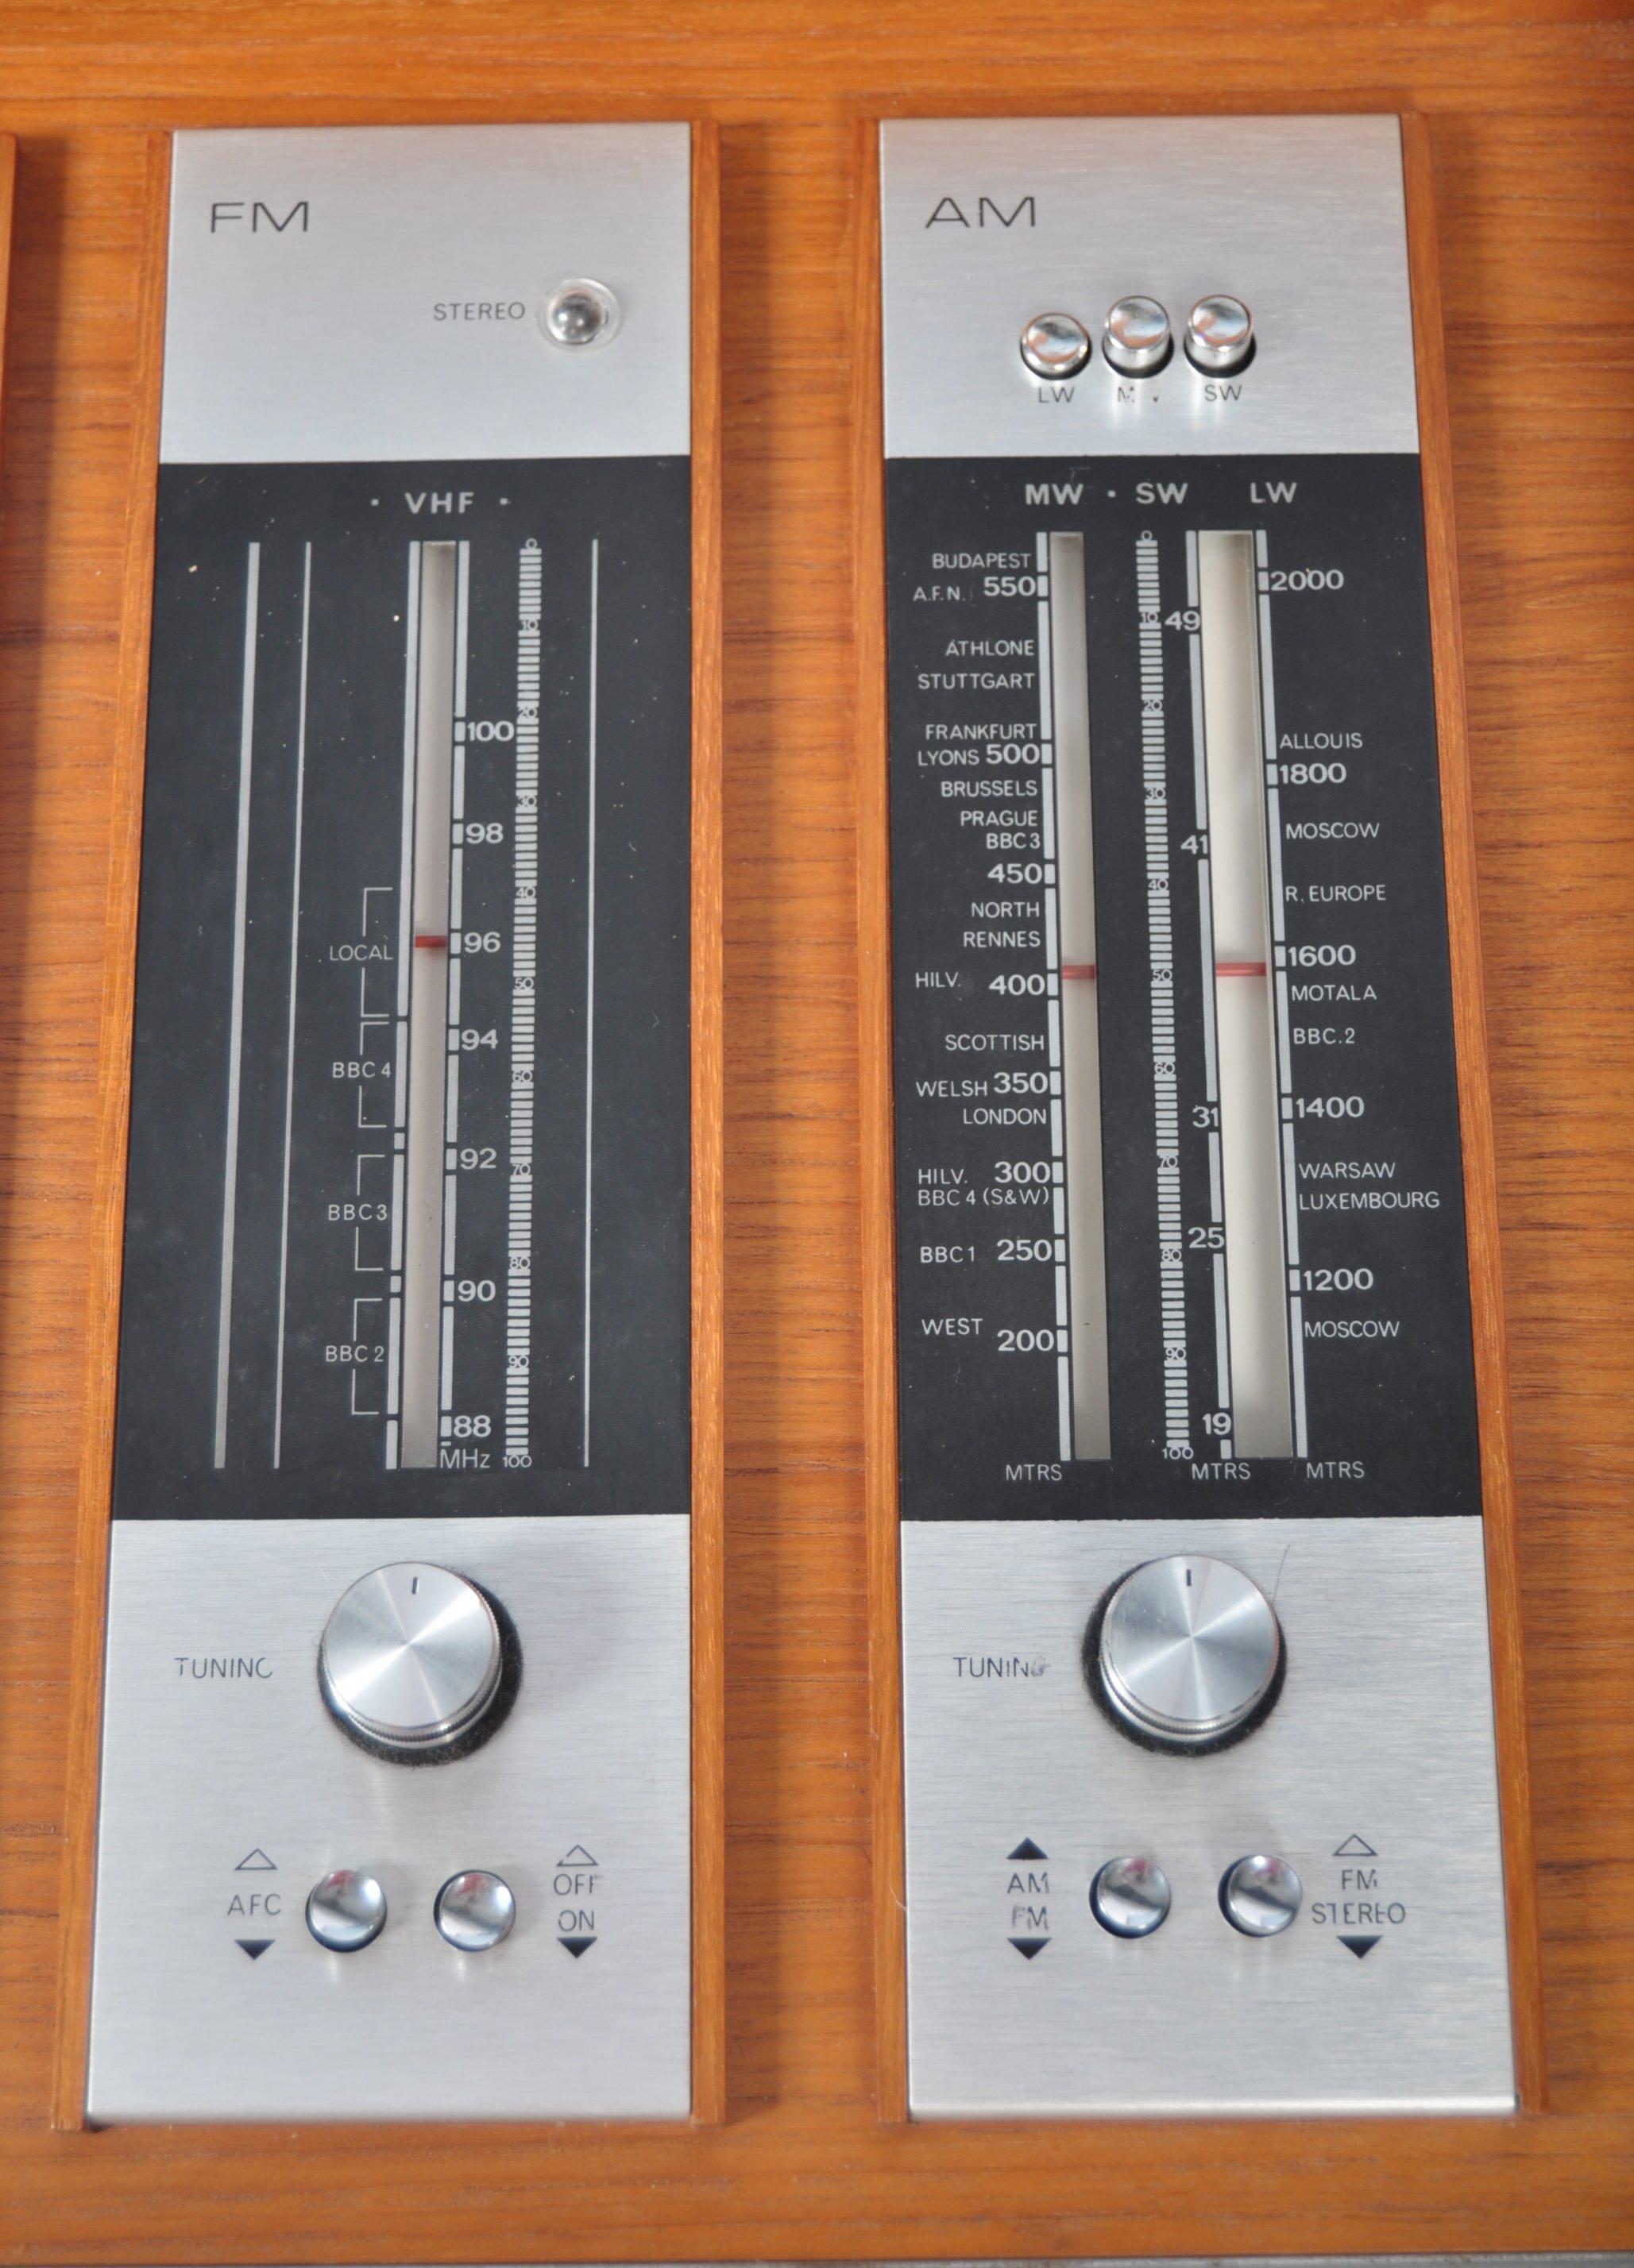 STUNNING DECCA SOUND TEAK CASED AUDIO SYSTEM RAISED ON CHROME SUPPORTS - Image 5 of 8